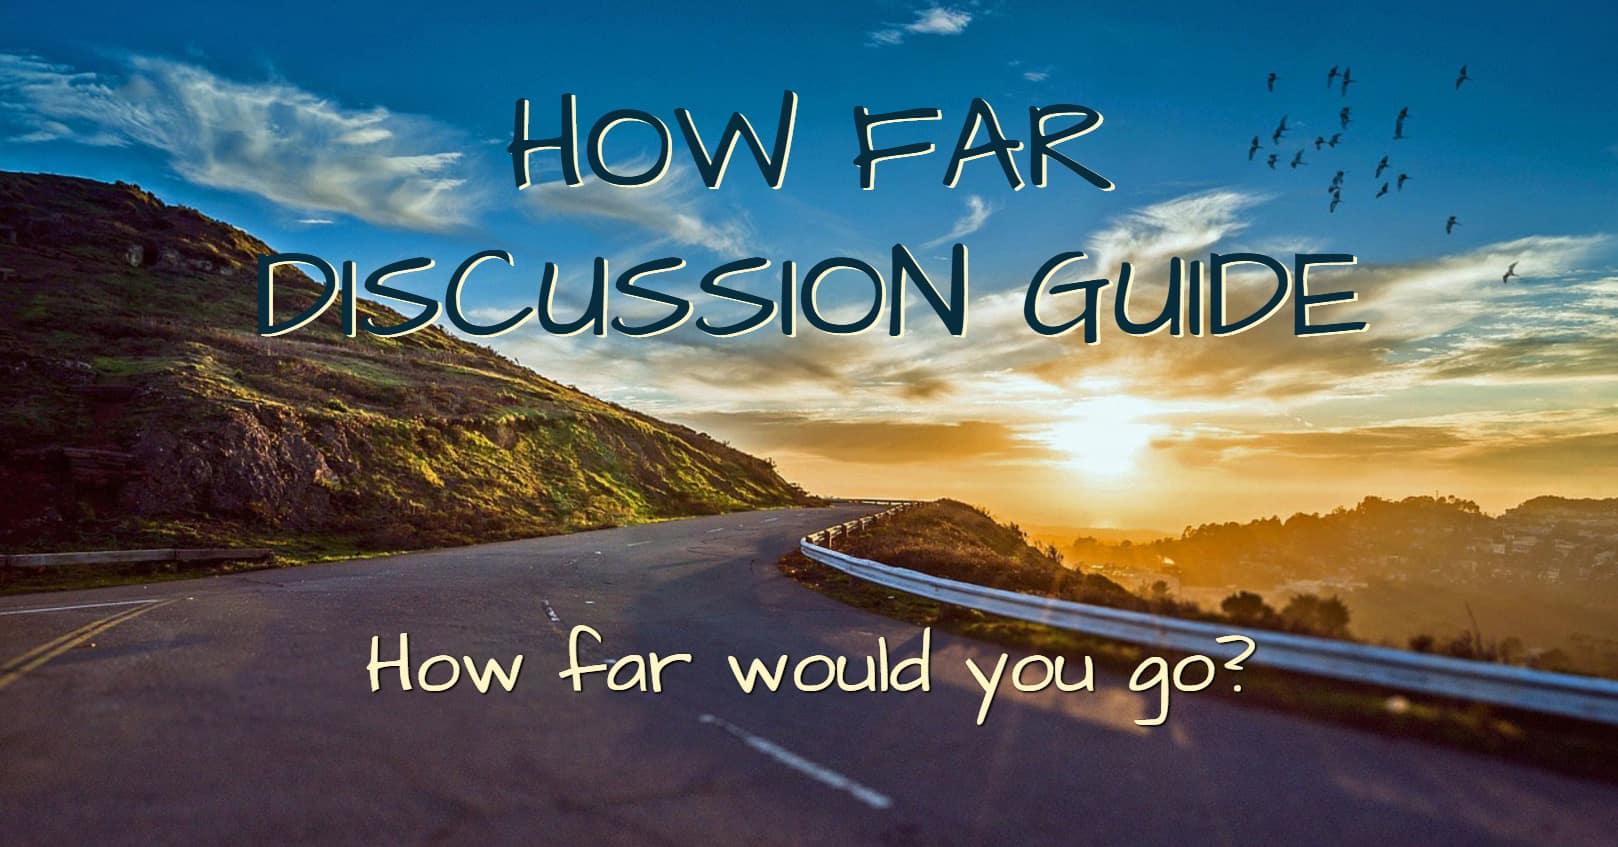 How Far Discussion Guide by Teyla Rachel Branton